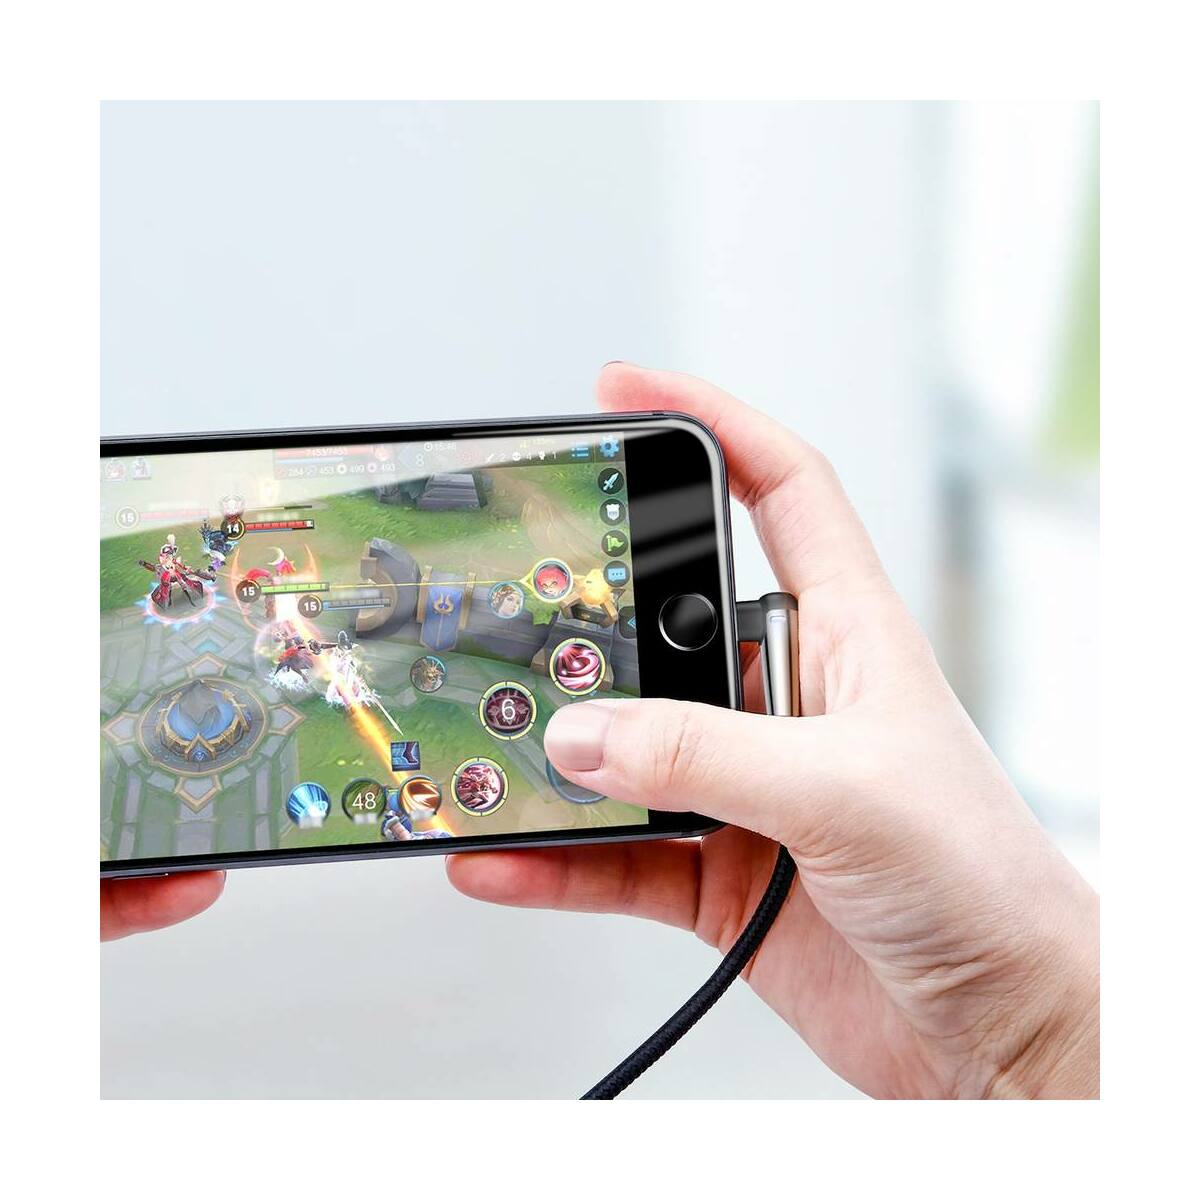 Baseus Lightning kábel, Sharp-bird Mobile Game, L-alakú csatlakozó, 2.4A, 1m, fekete (CALMVP-D01)